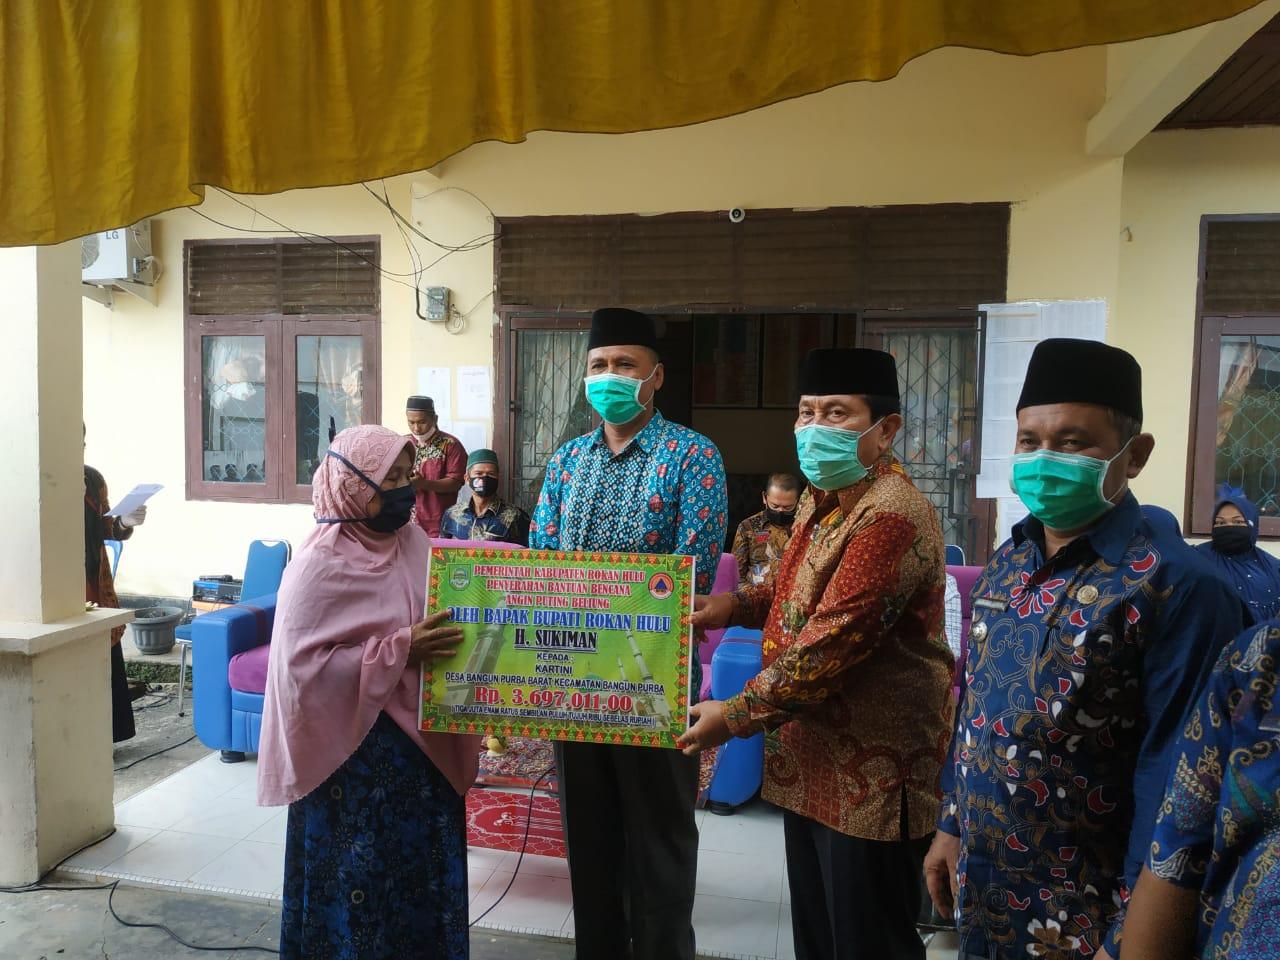 Bupati Rohul H. Sukiman Serahkan Bantuan Korban Bencana Alam di Desa Bangun Purba Barat